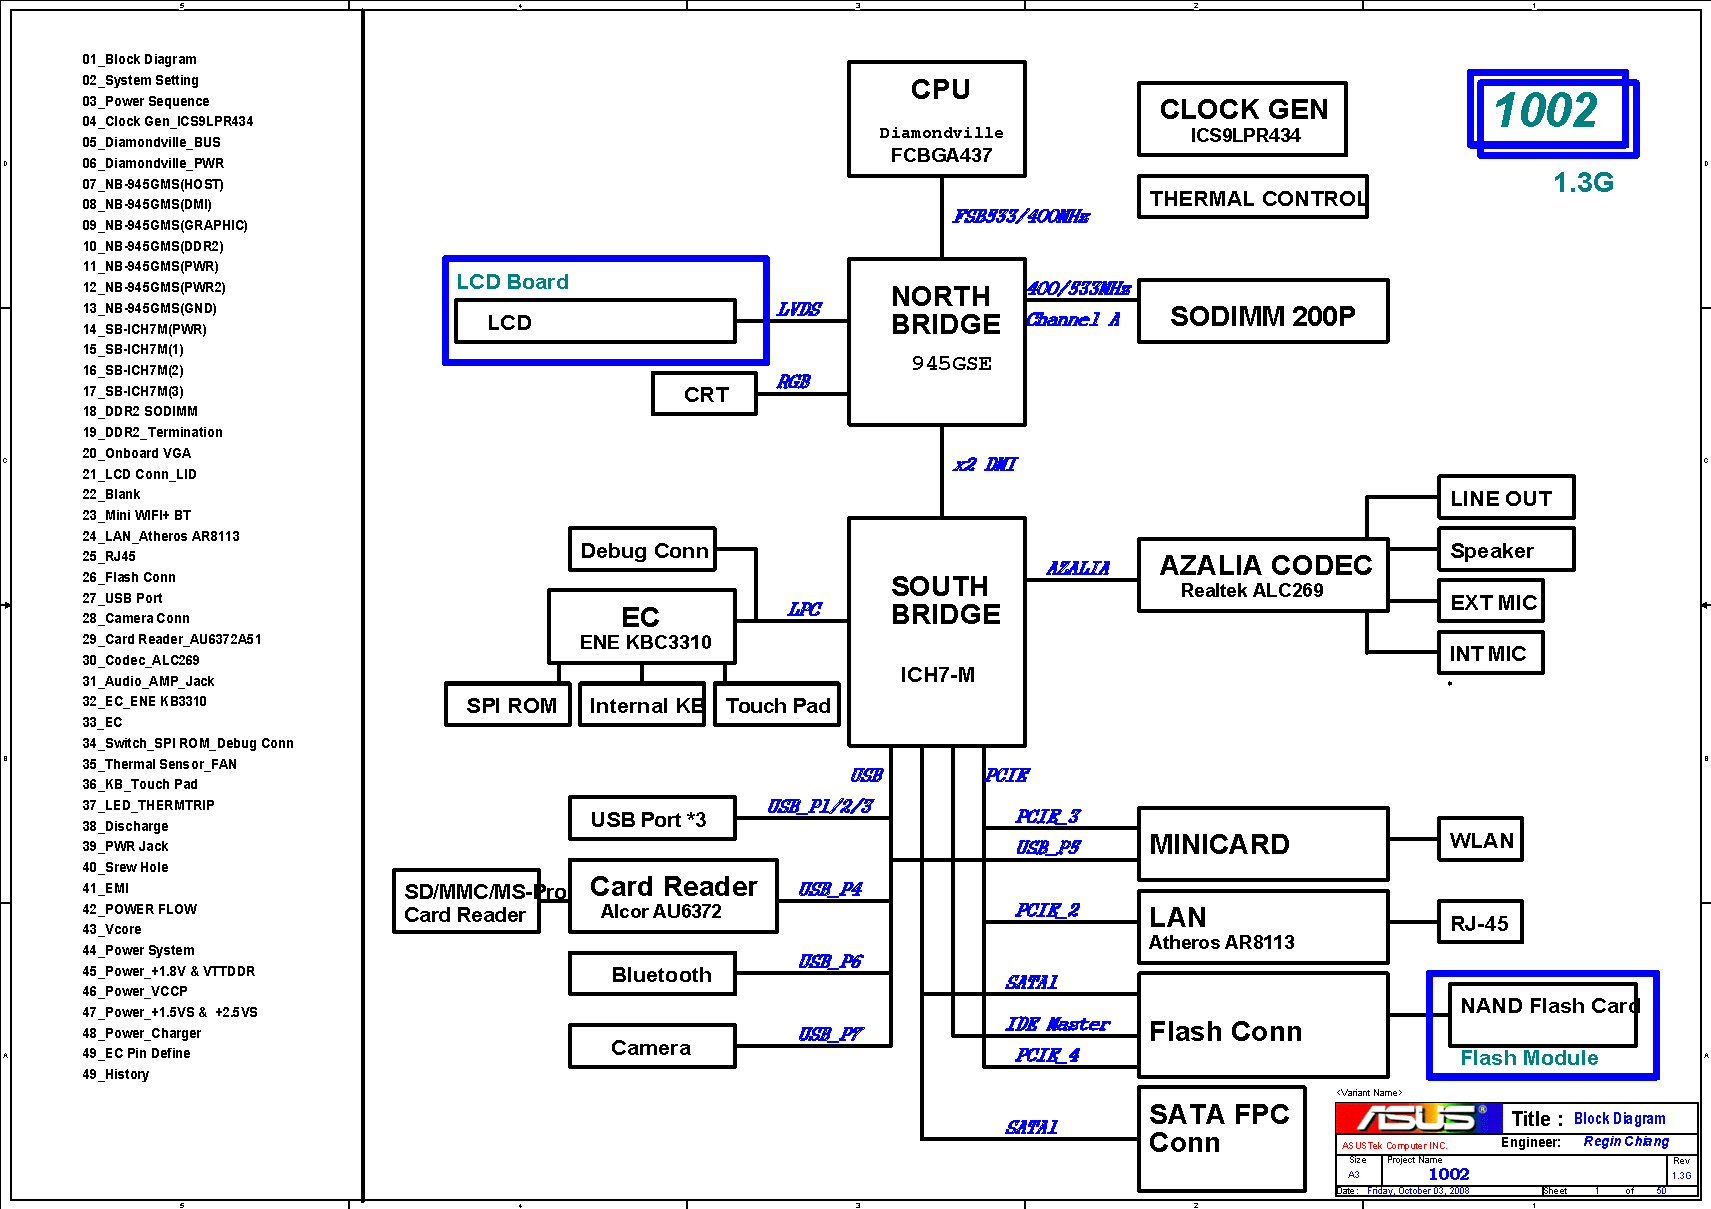 hight resolution of asus eee pc p901 block diagram wiring diagram for youblock diagram 3g 16